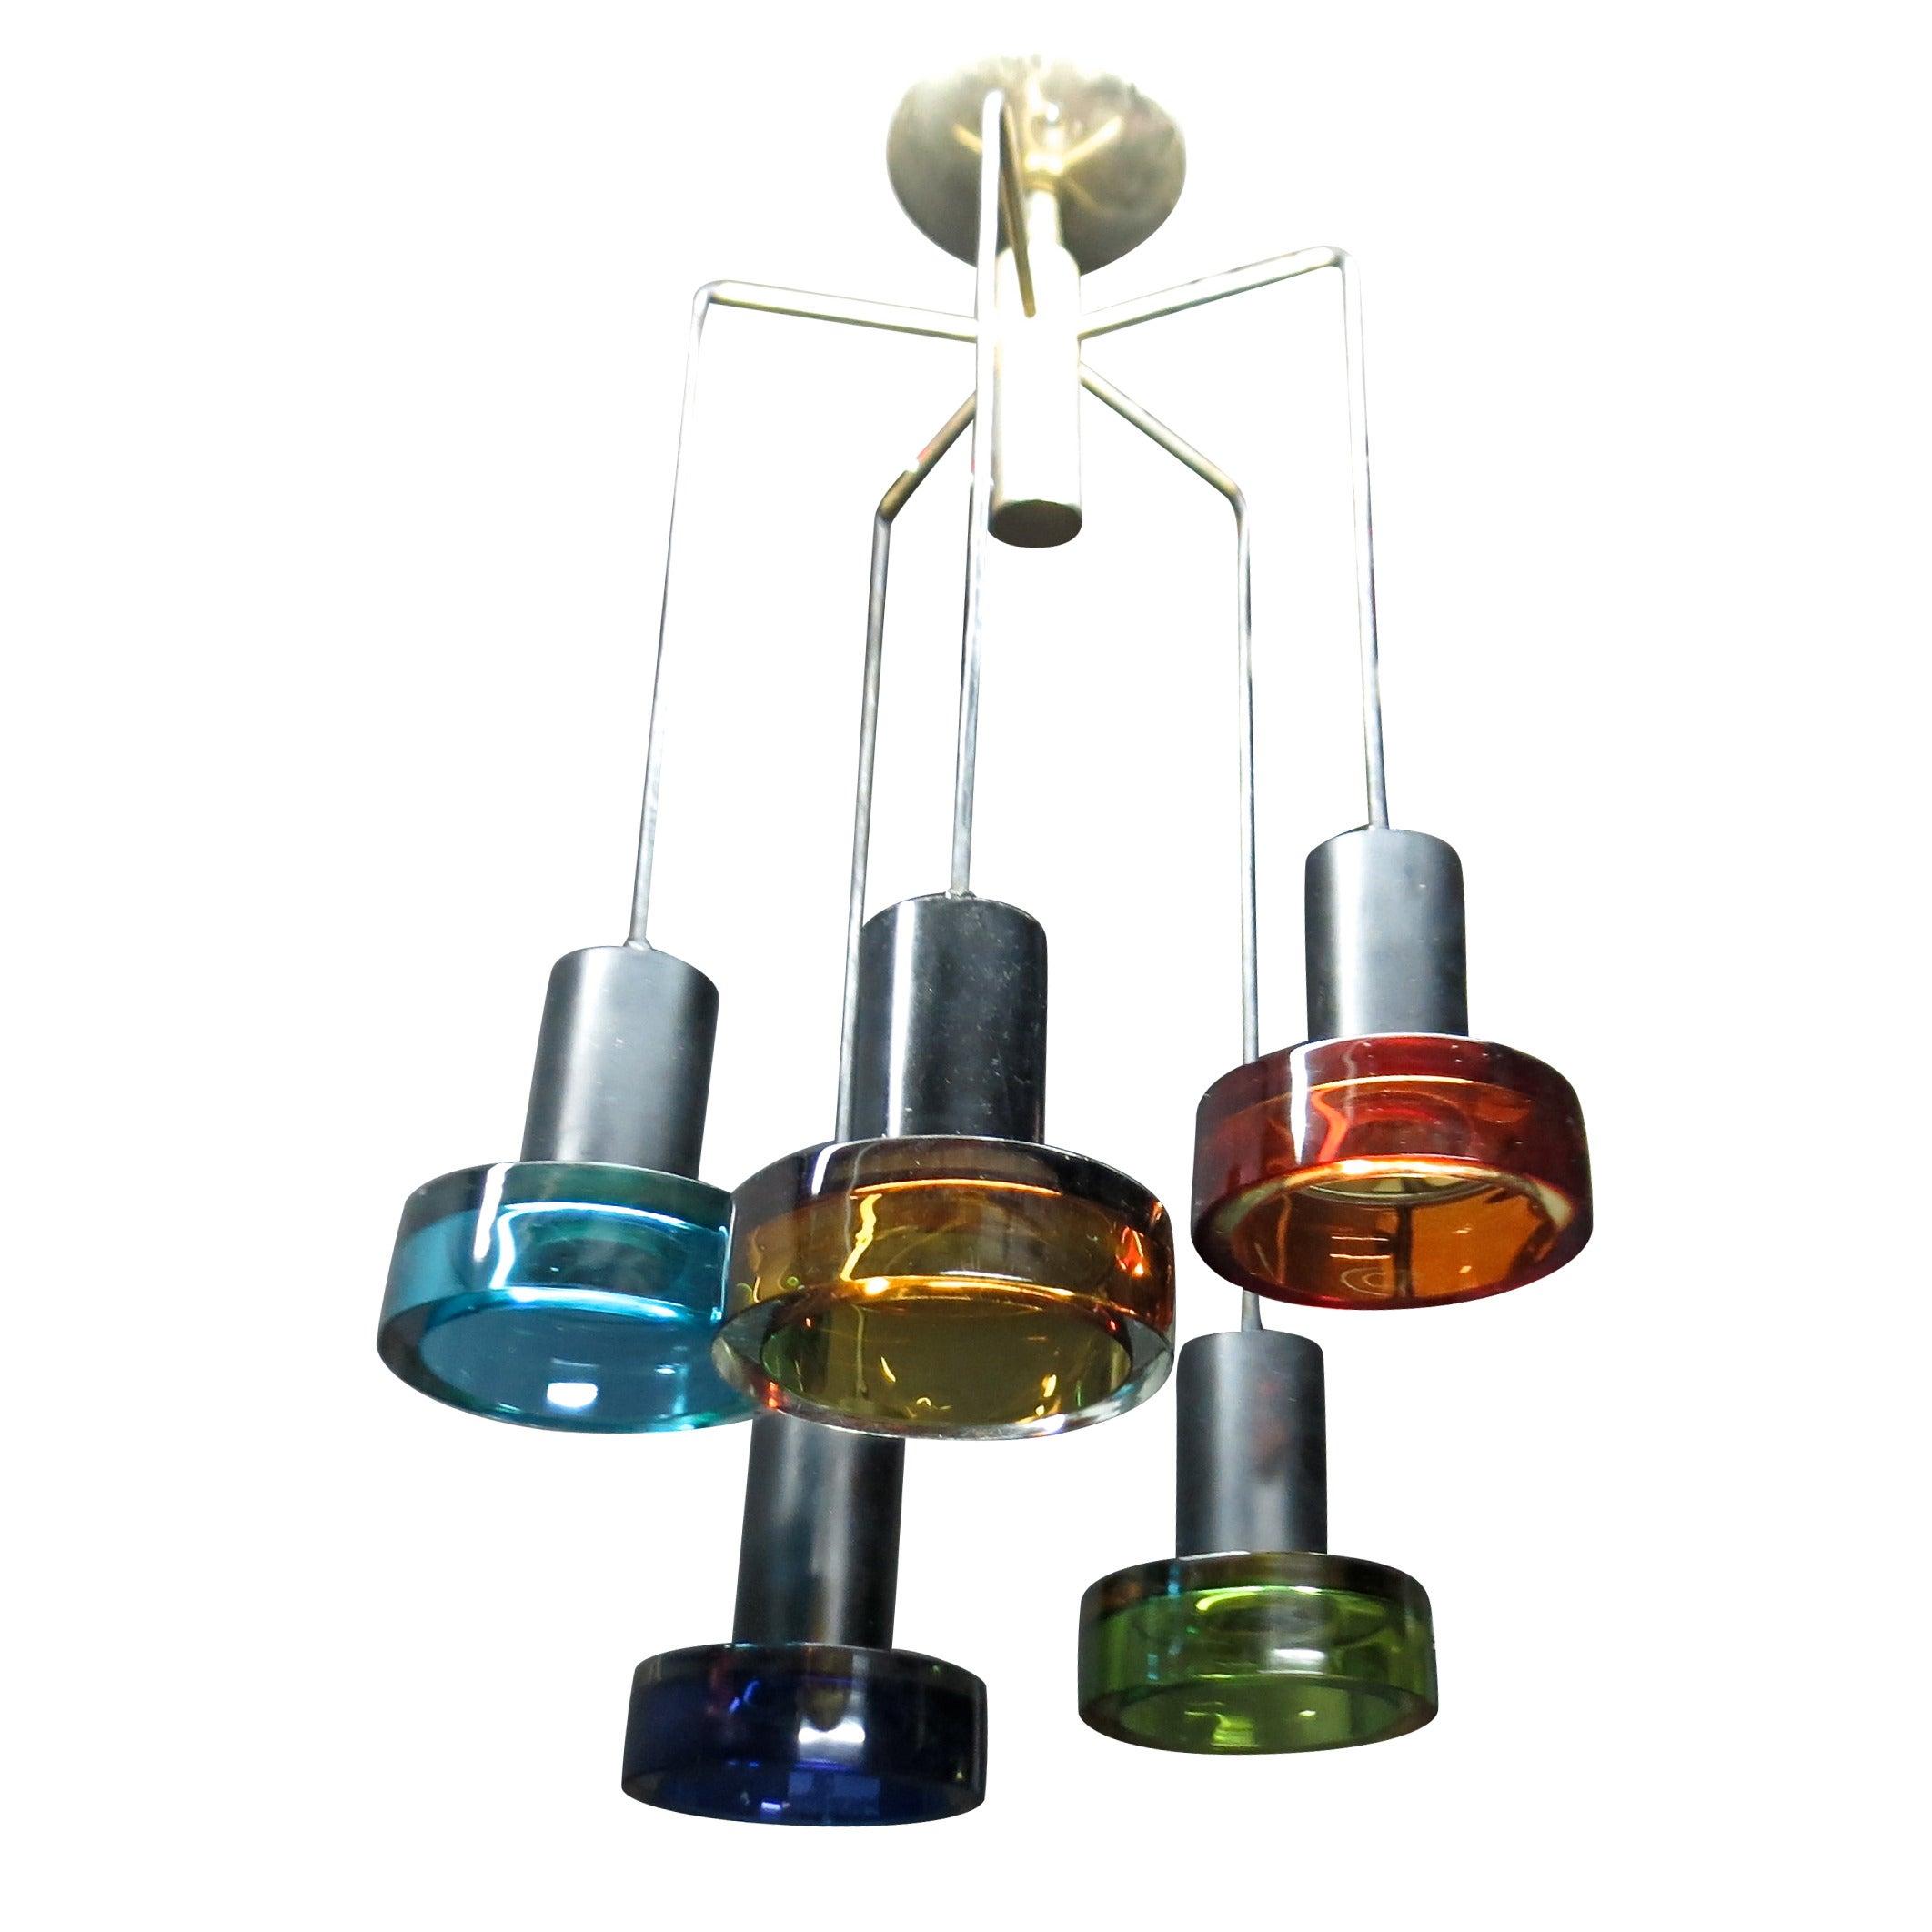 Glass Ceiling Fixture by Flavio Poli for Seguso, Italy Circa 1950